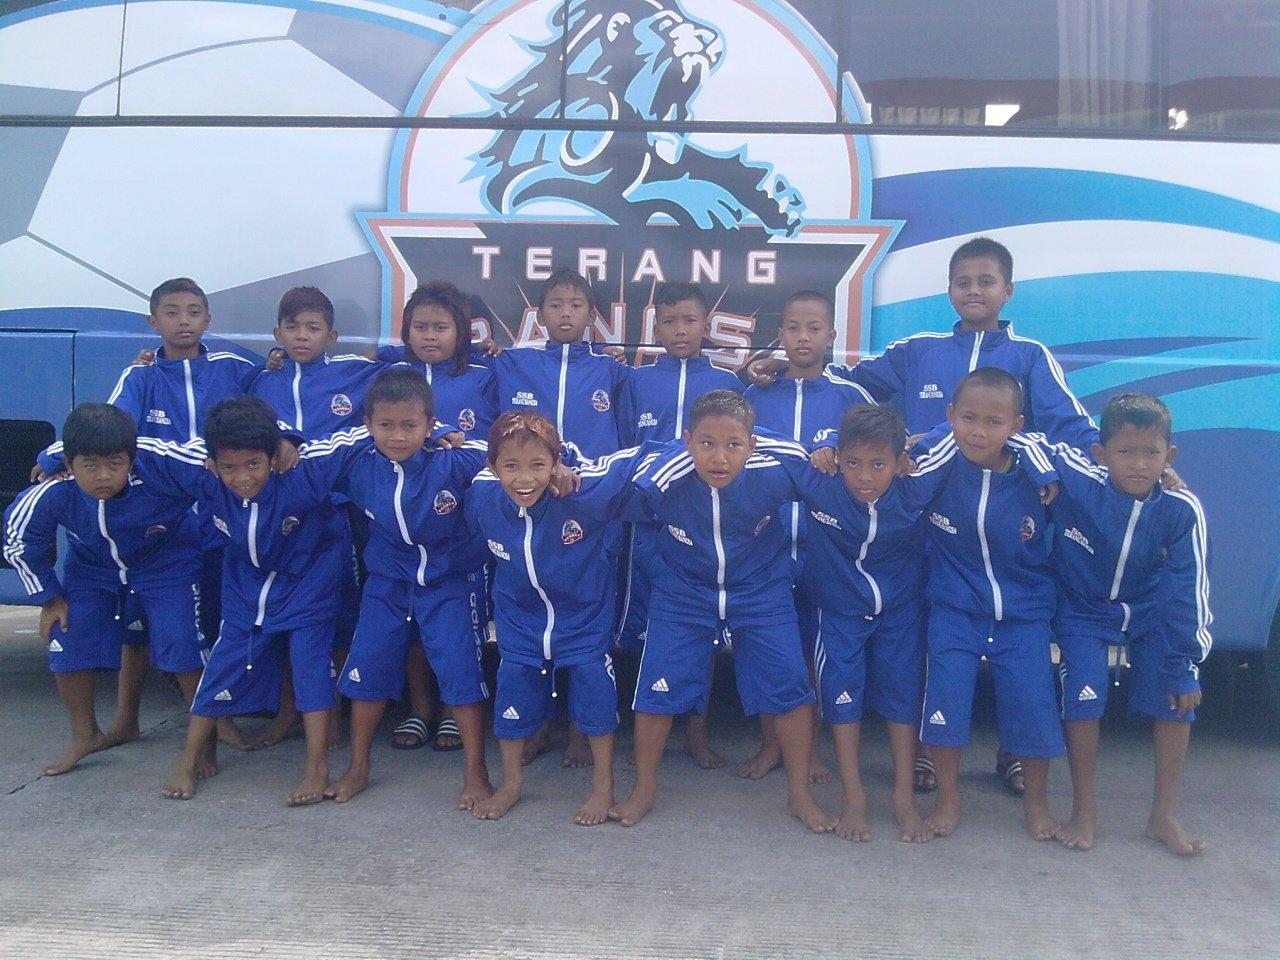 sekolah sepak bola terang bangsa